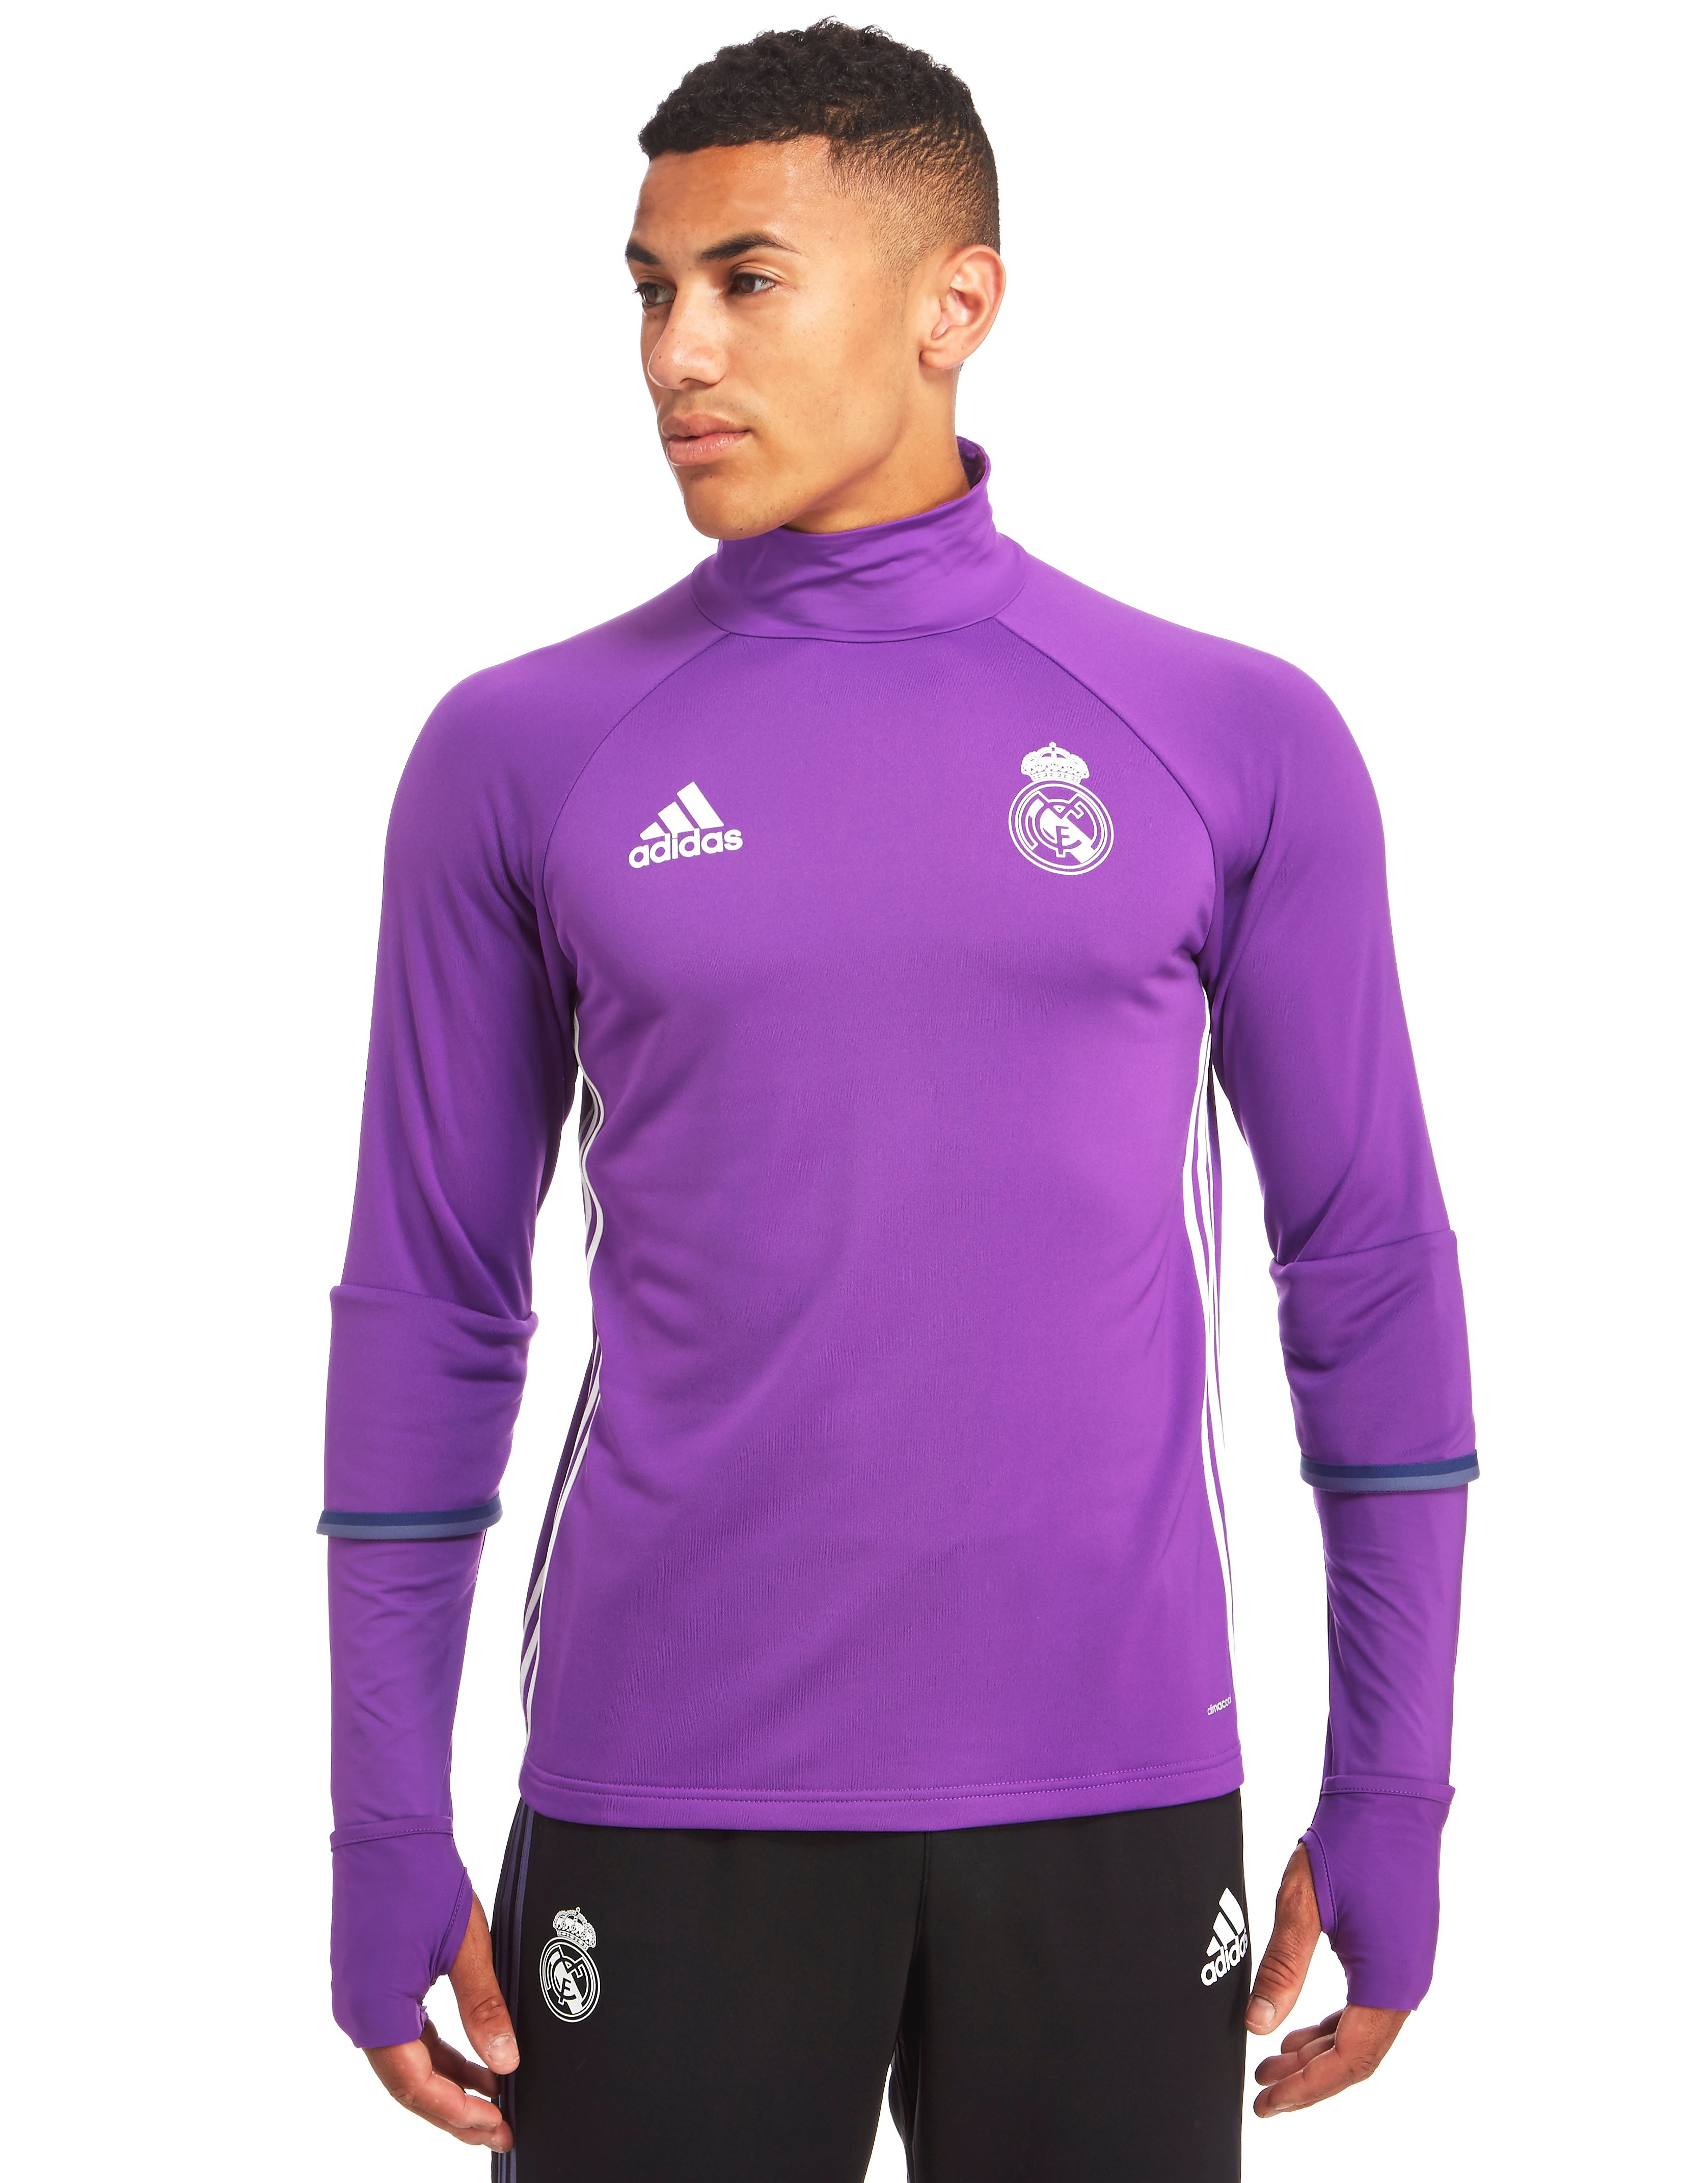 adidas Real Madrid 2016 Training Top